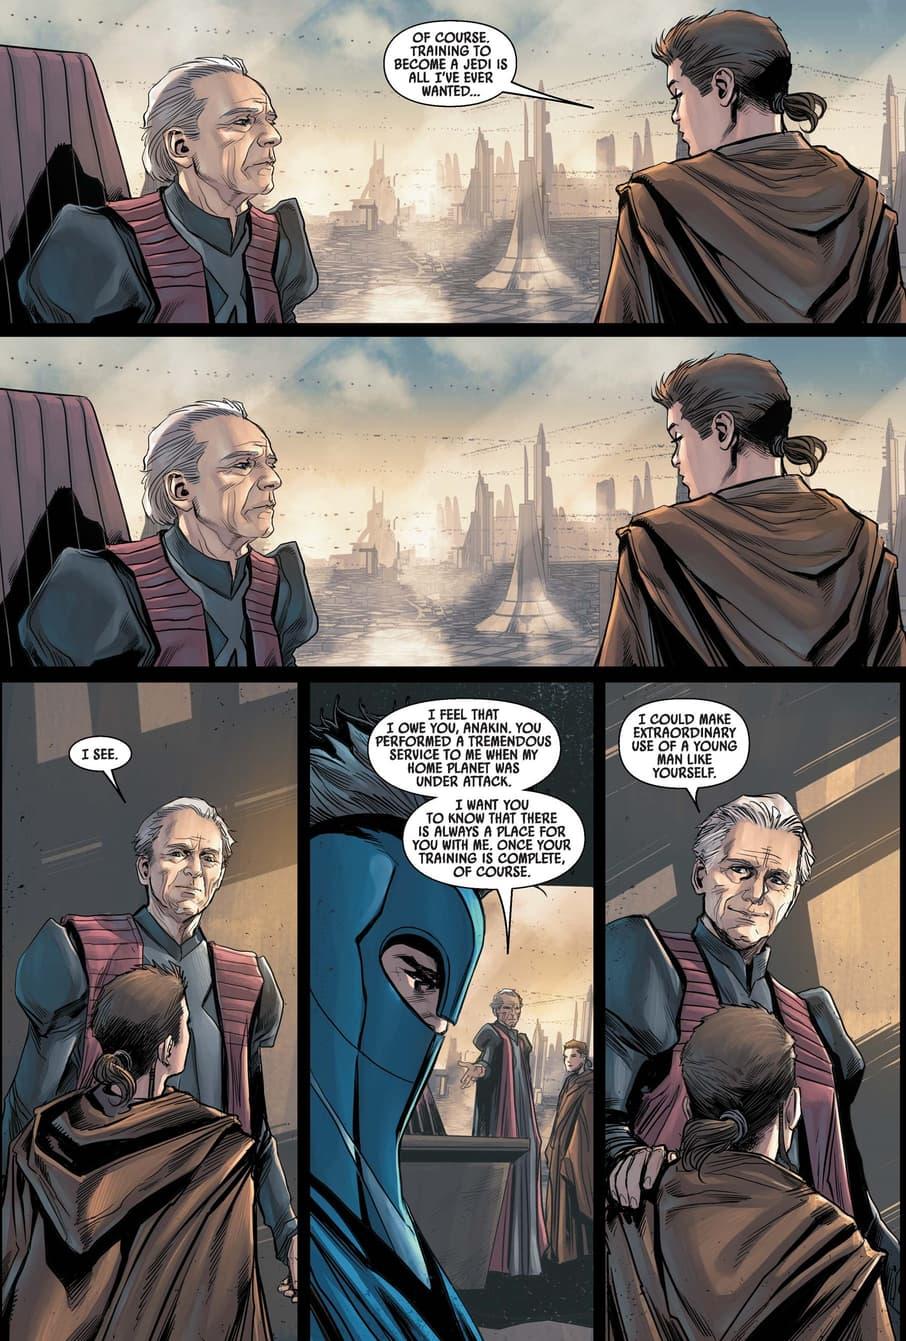 Palpatine gains influence over Anakin Skywalker.